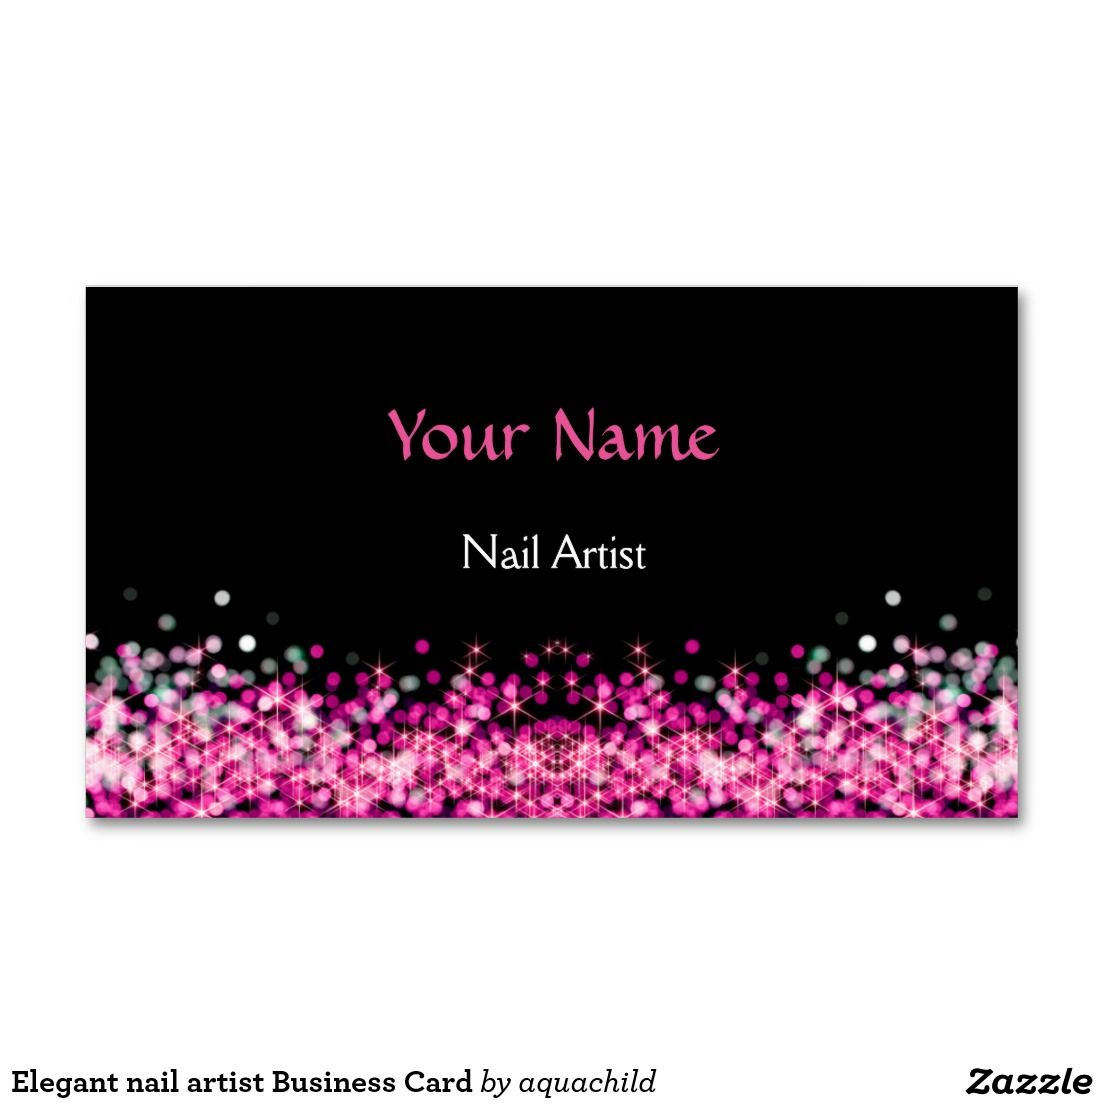 Elegant nail artist Business Card | Customized Nail Salon Business ...